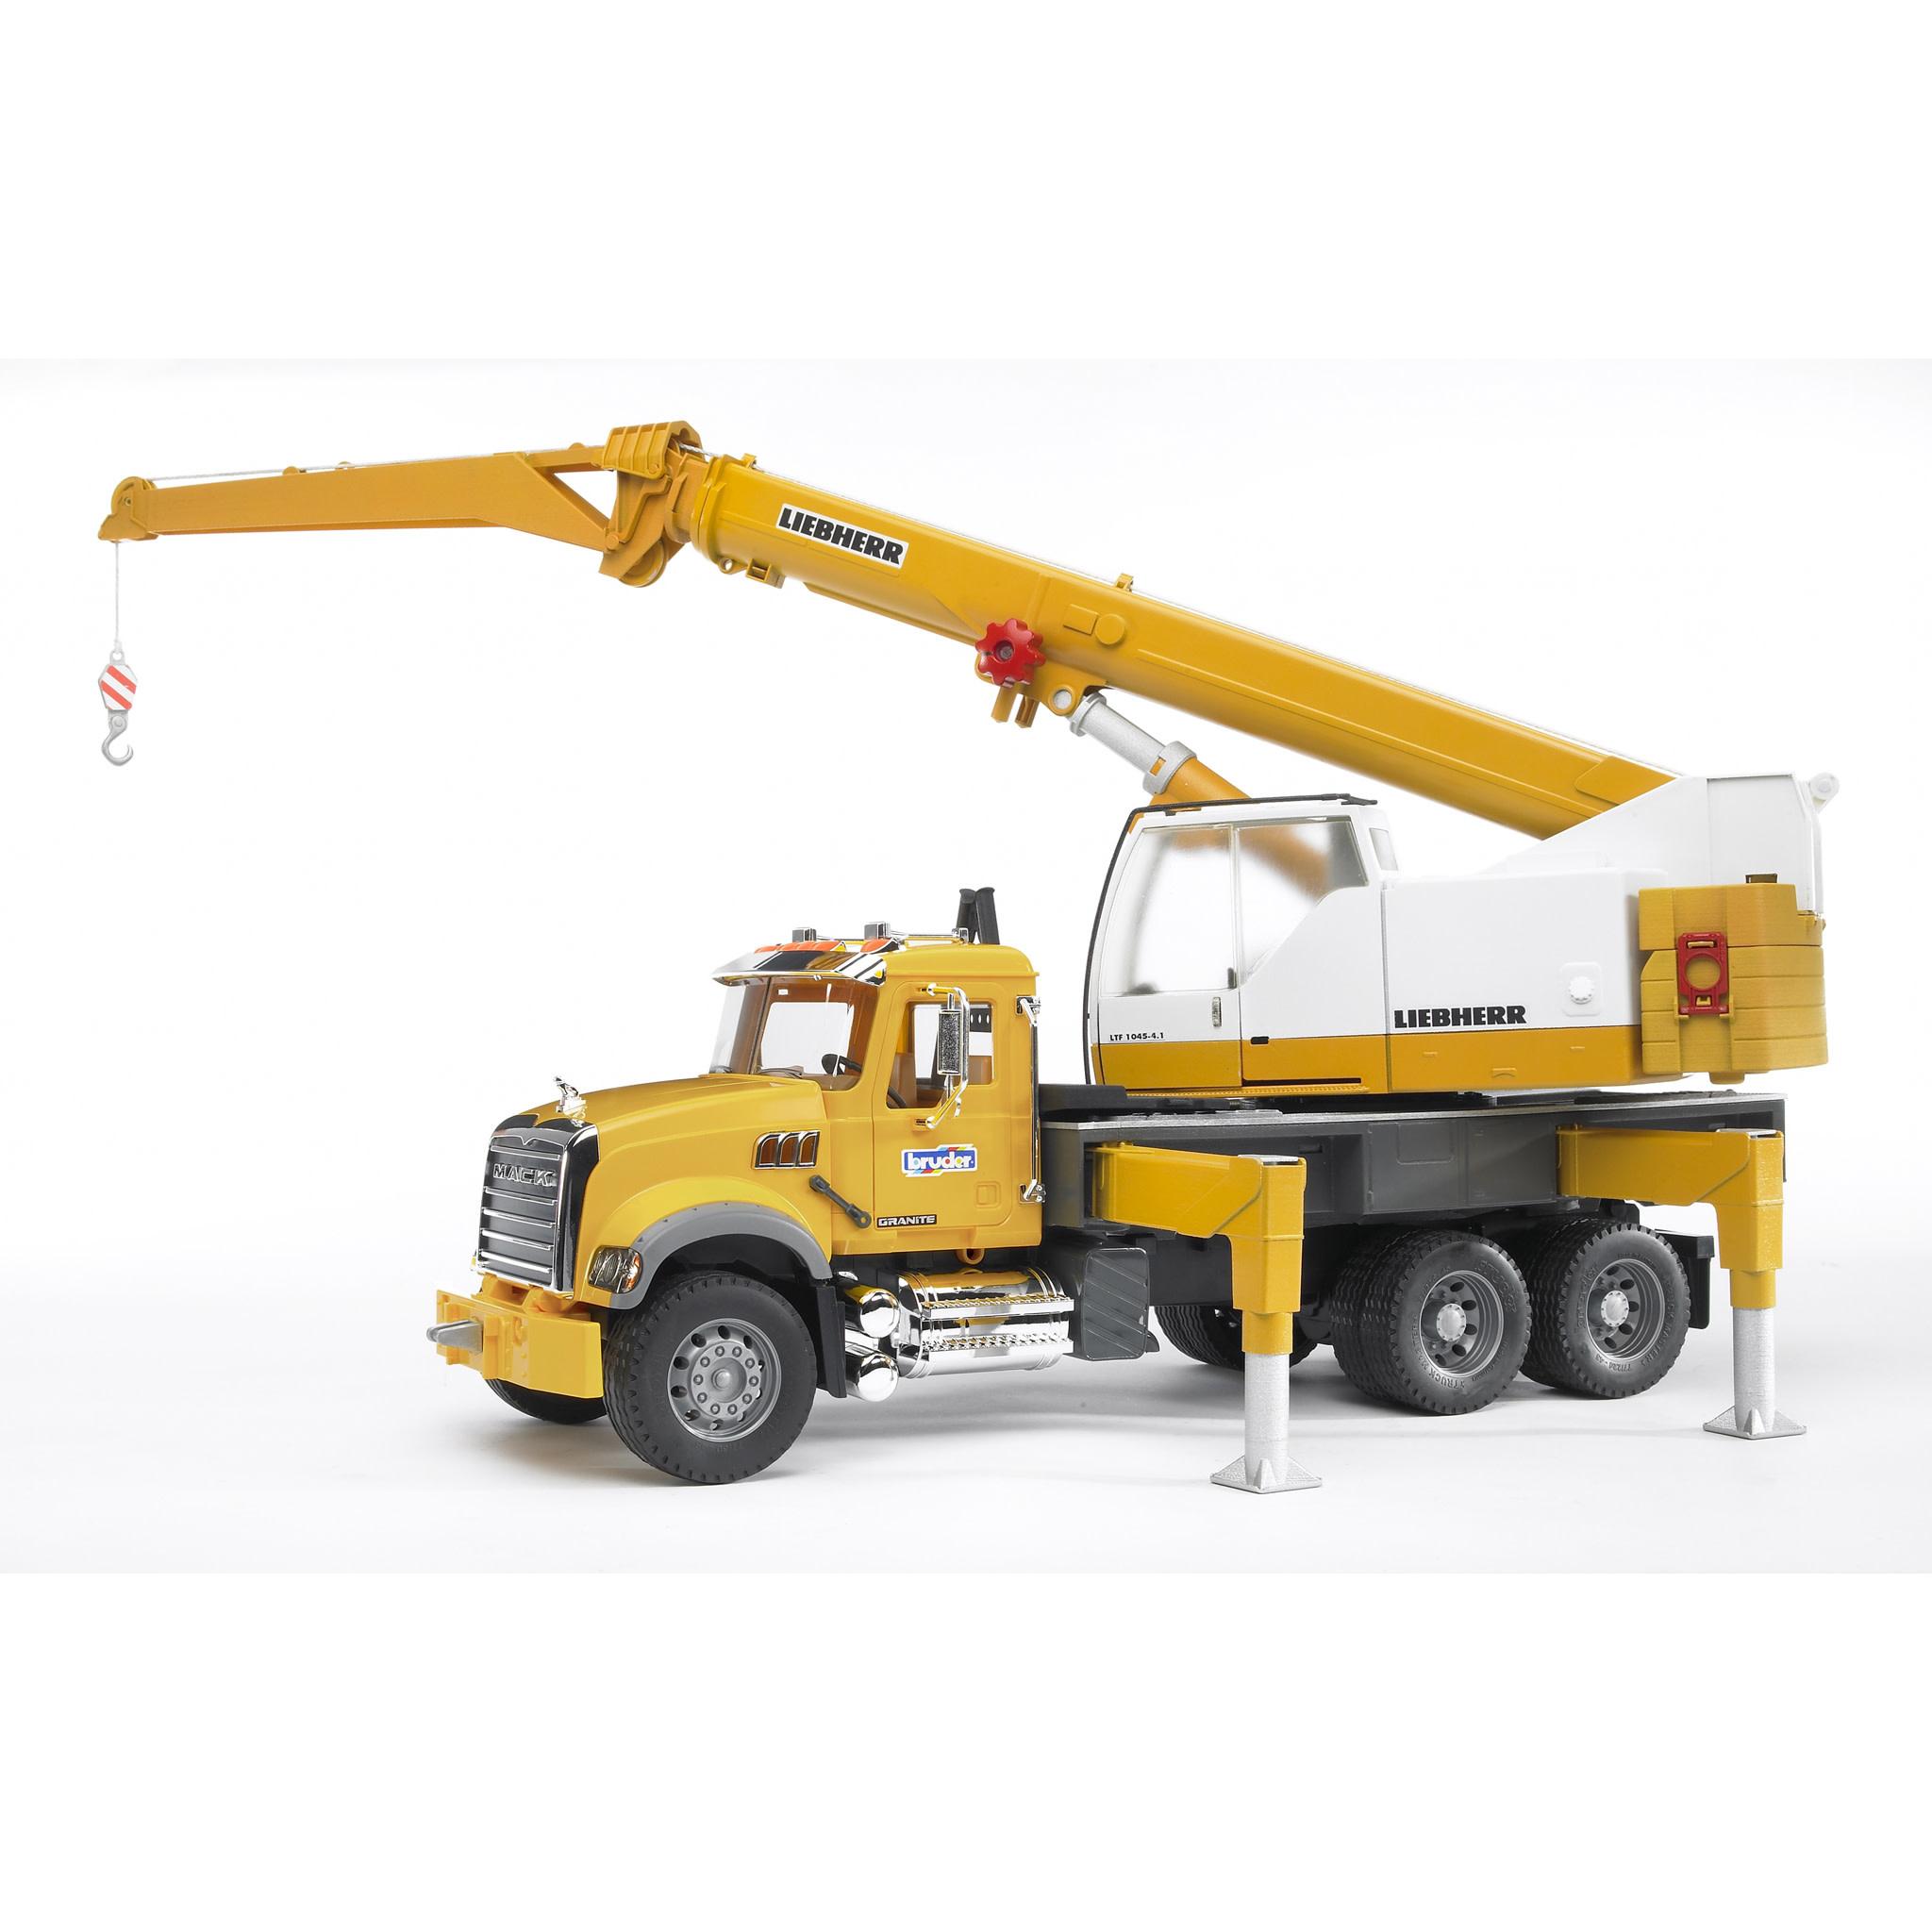 Bruder/MACK Crane Truck-1